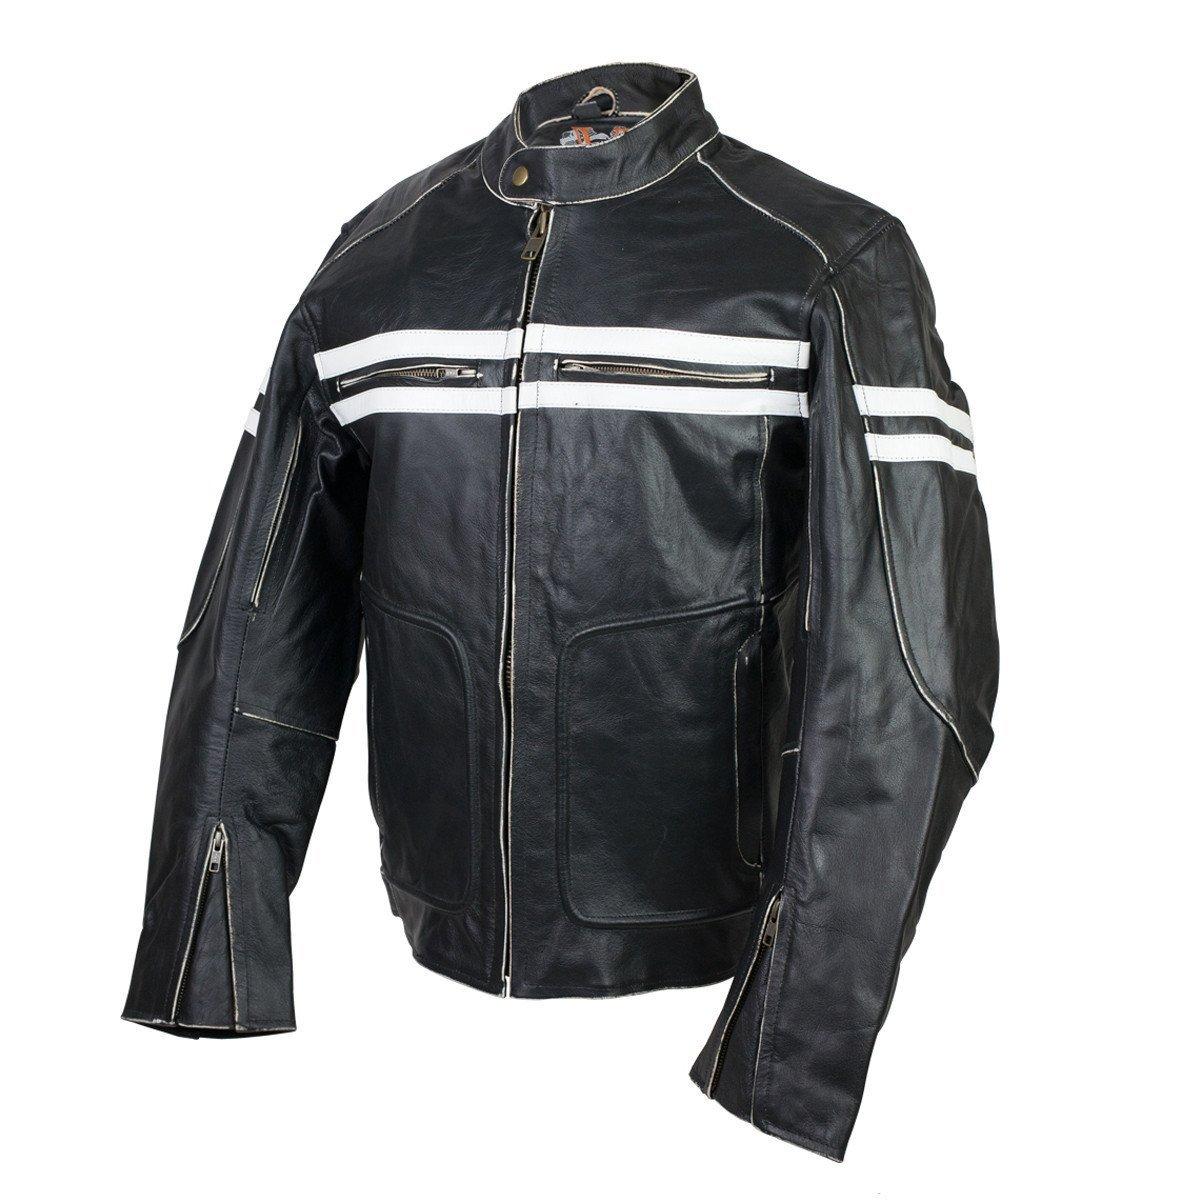 Vintage Premium Distressed Leather Motorcycle Leather Jacket